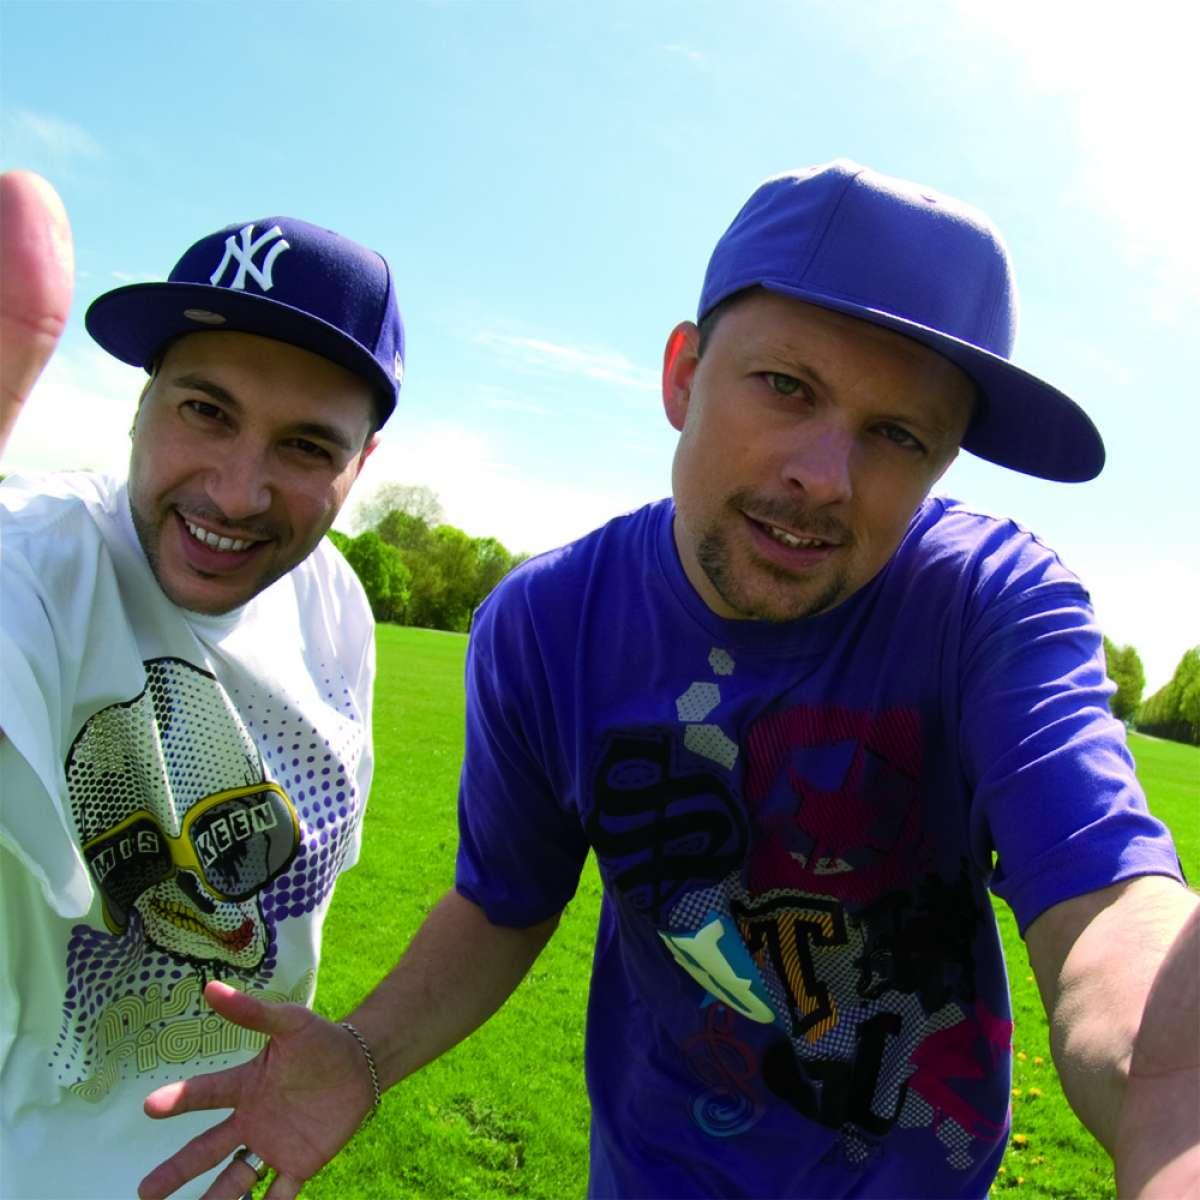 Planet Radio Straight Outta Compton Filmparty - DJ Ray D und DJ Jellin - Autokino  - Open Air Arena - Homberg (Efze)